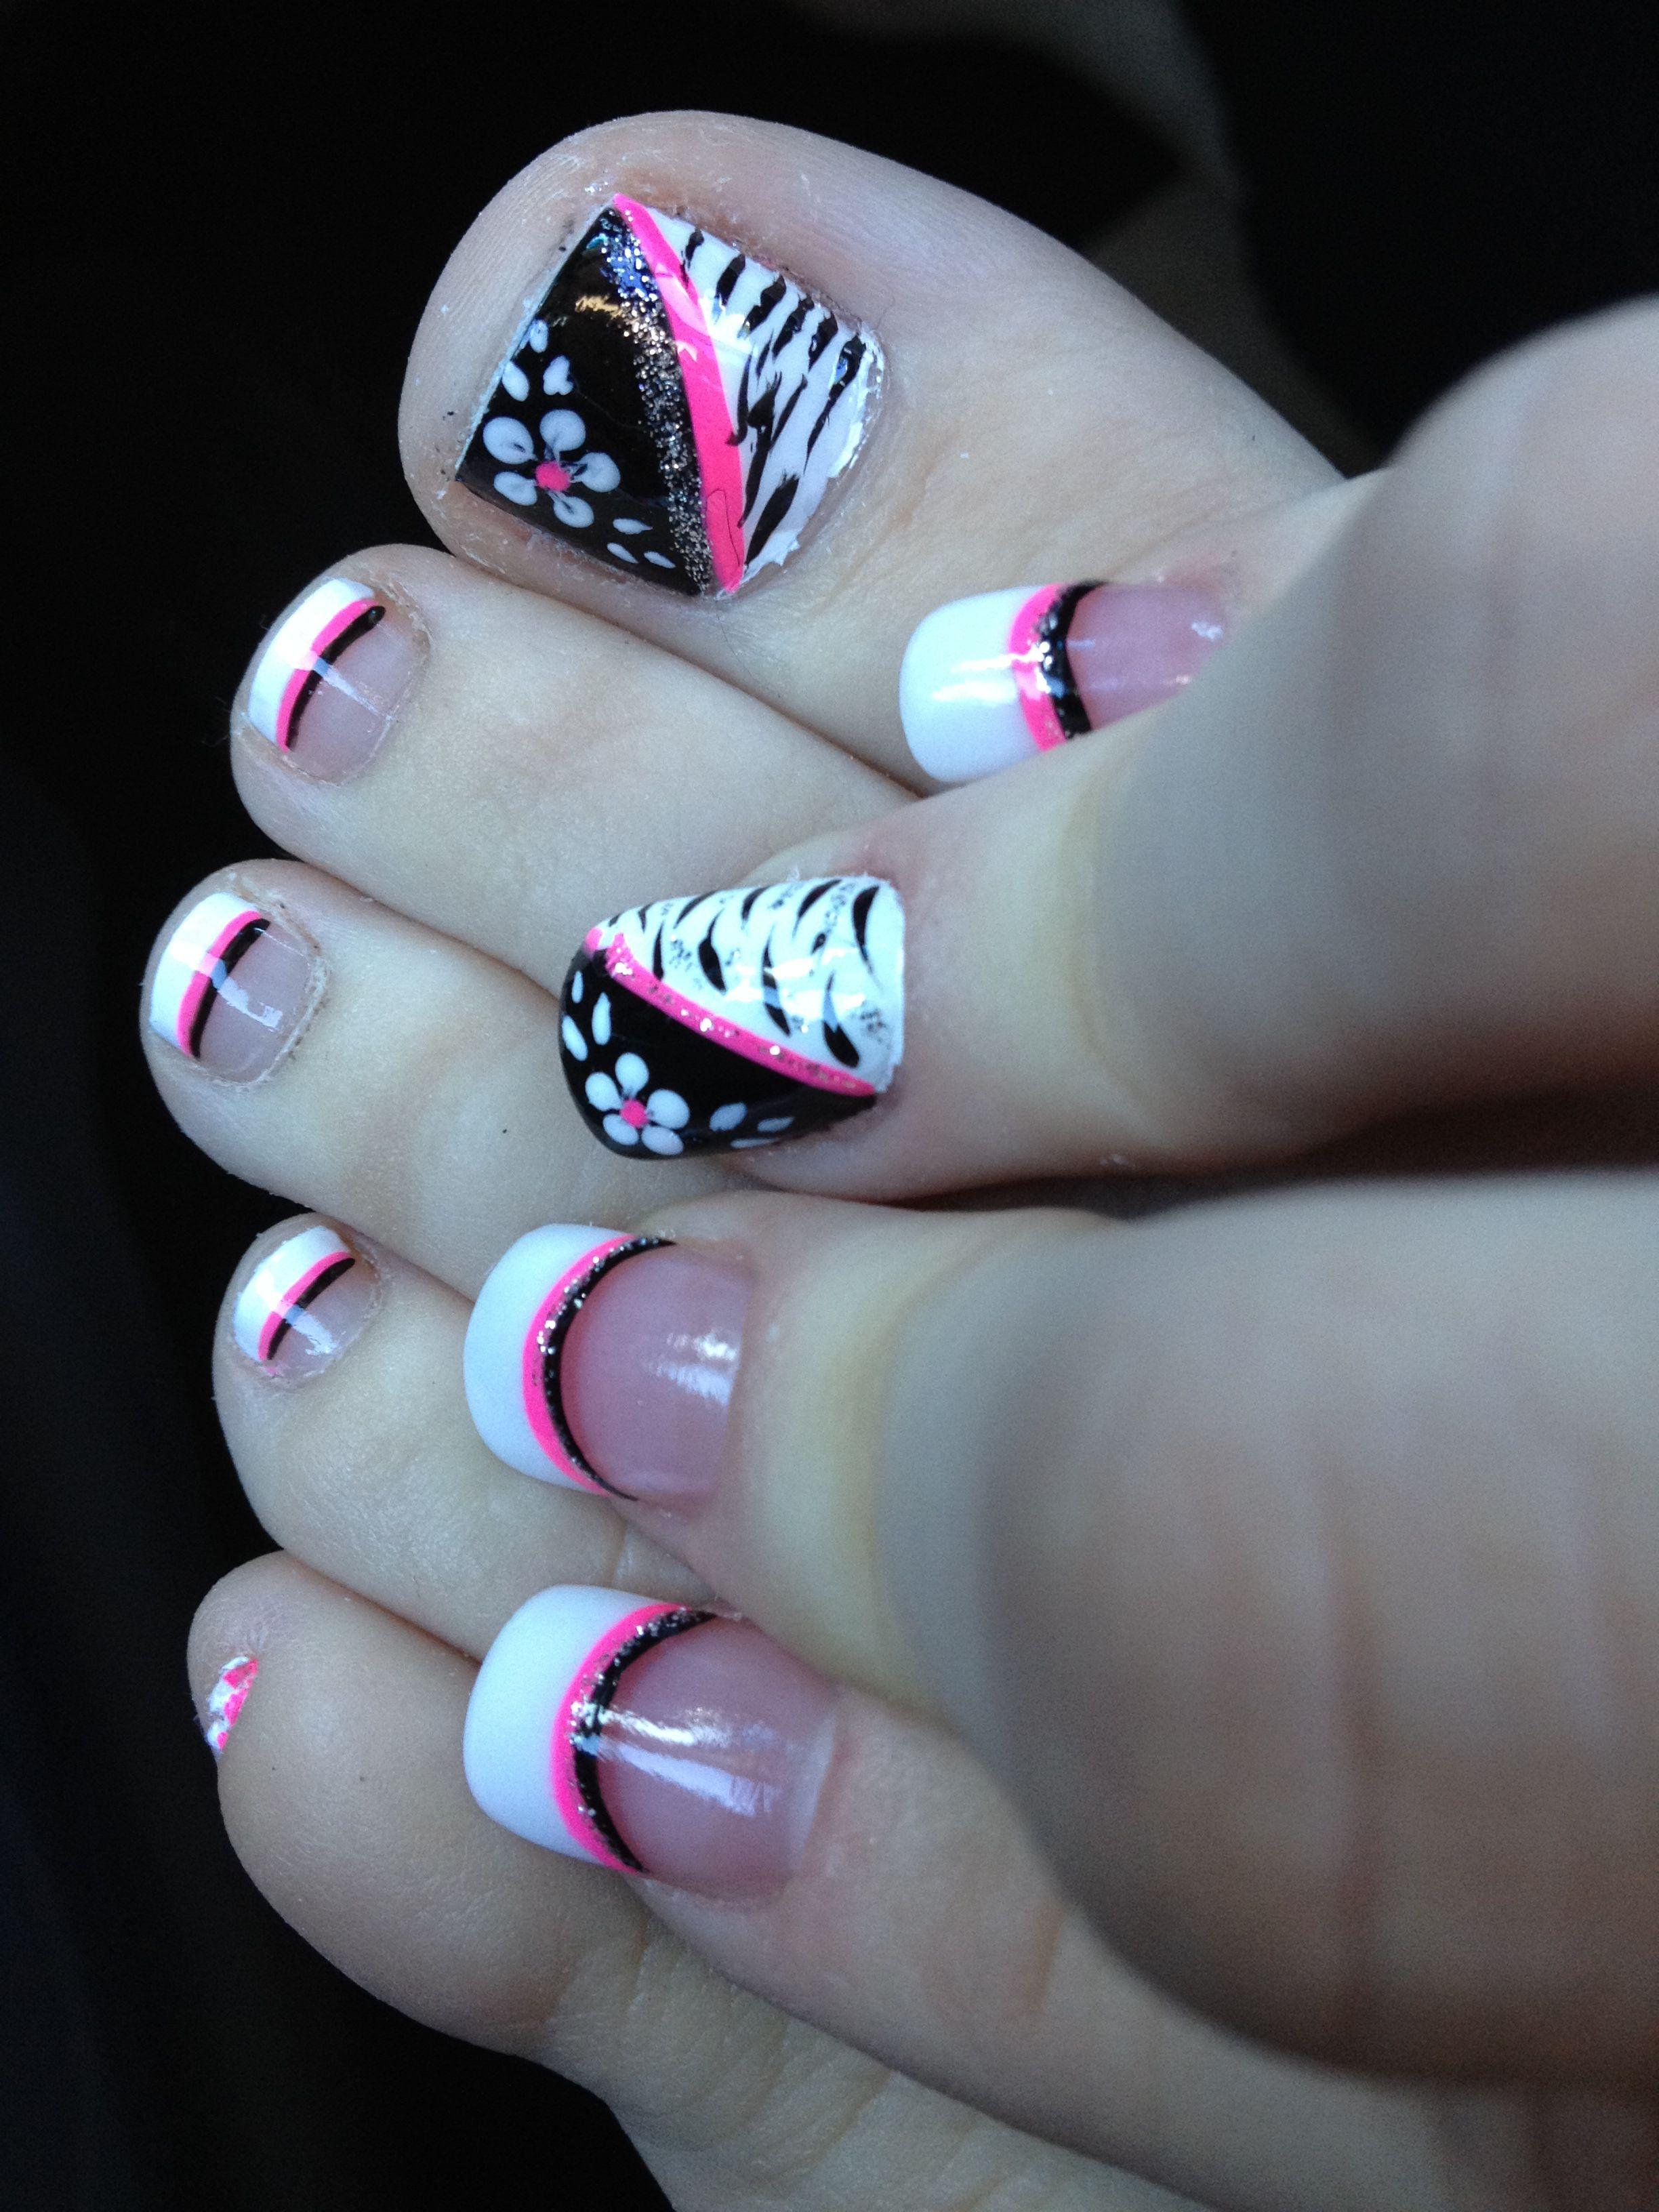 Matching toes! She has a tiny pinkie toe nail like me! ahaha ...